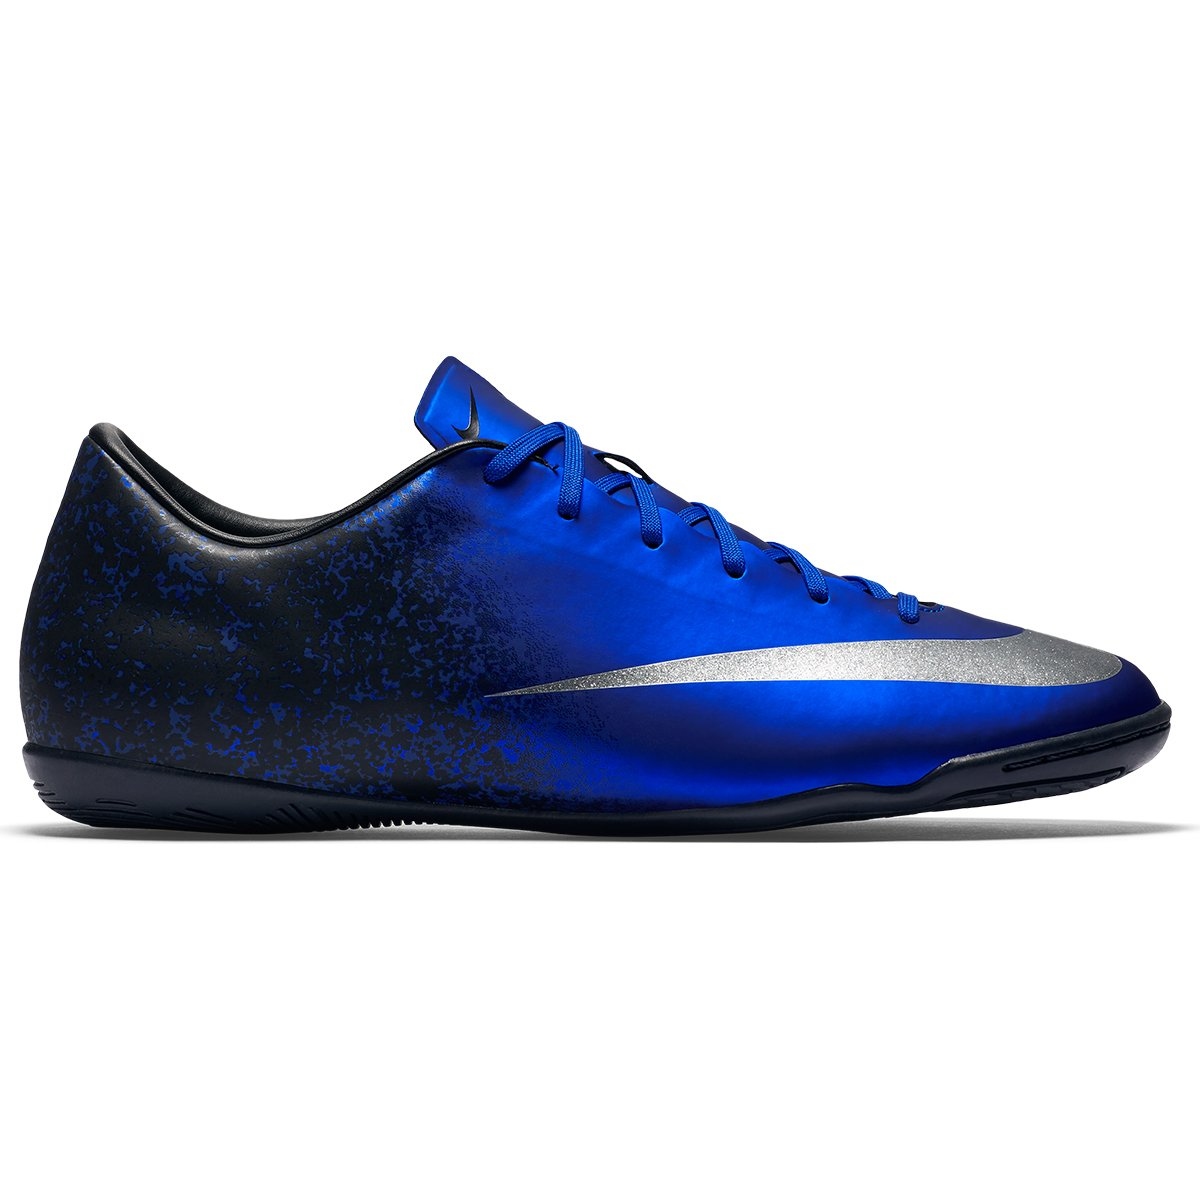 014be28260 Chuteira Nike Mercurial Victory 5 CR7 IC Futsal - Compre Agora ...